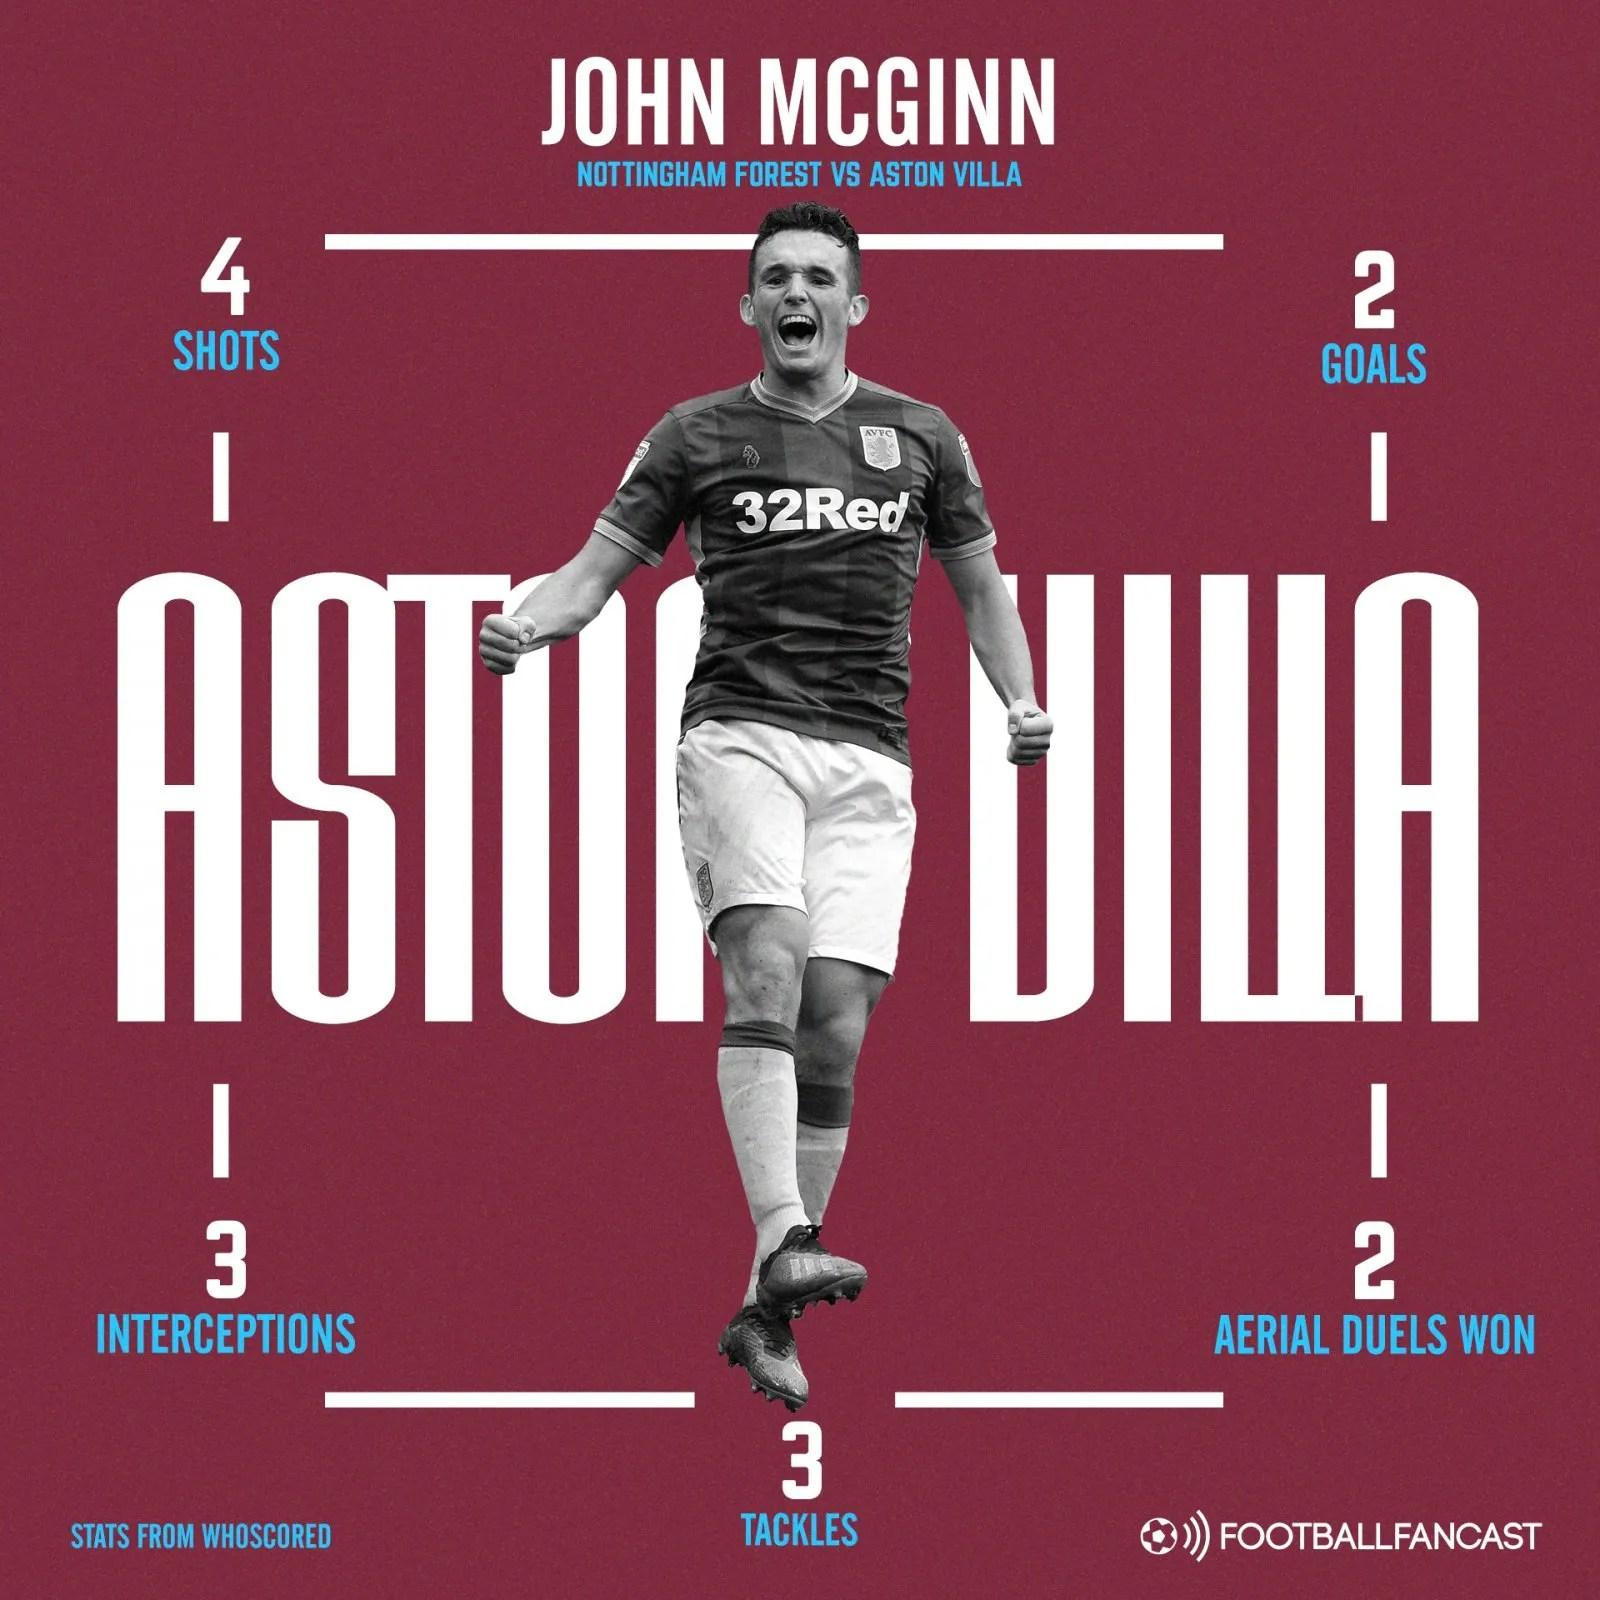 Aston Villa midfielder John McGinn's stats vs Nottingham Forest